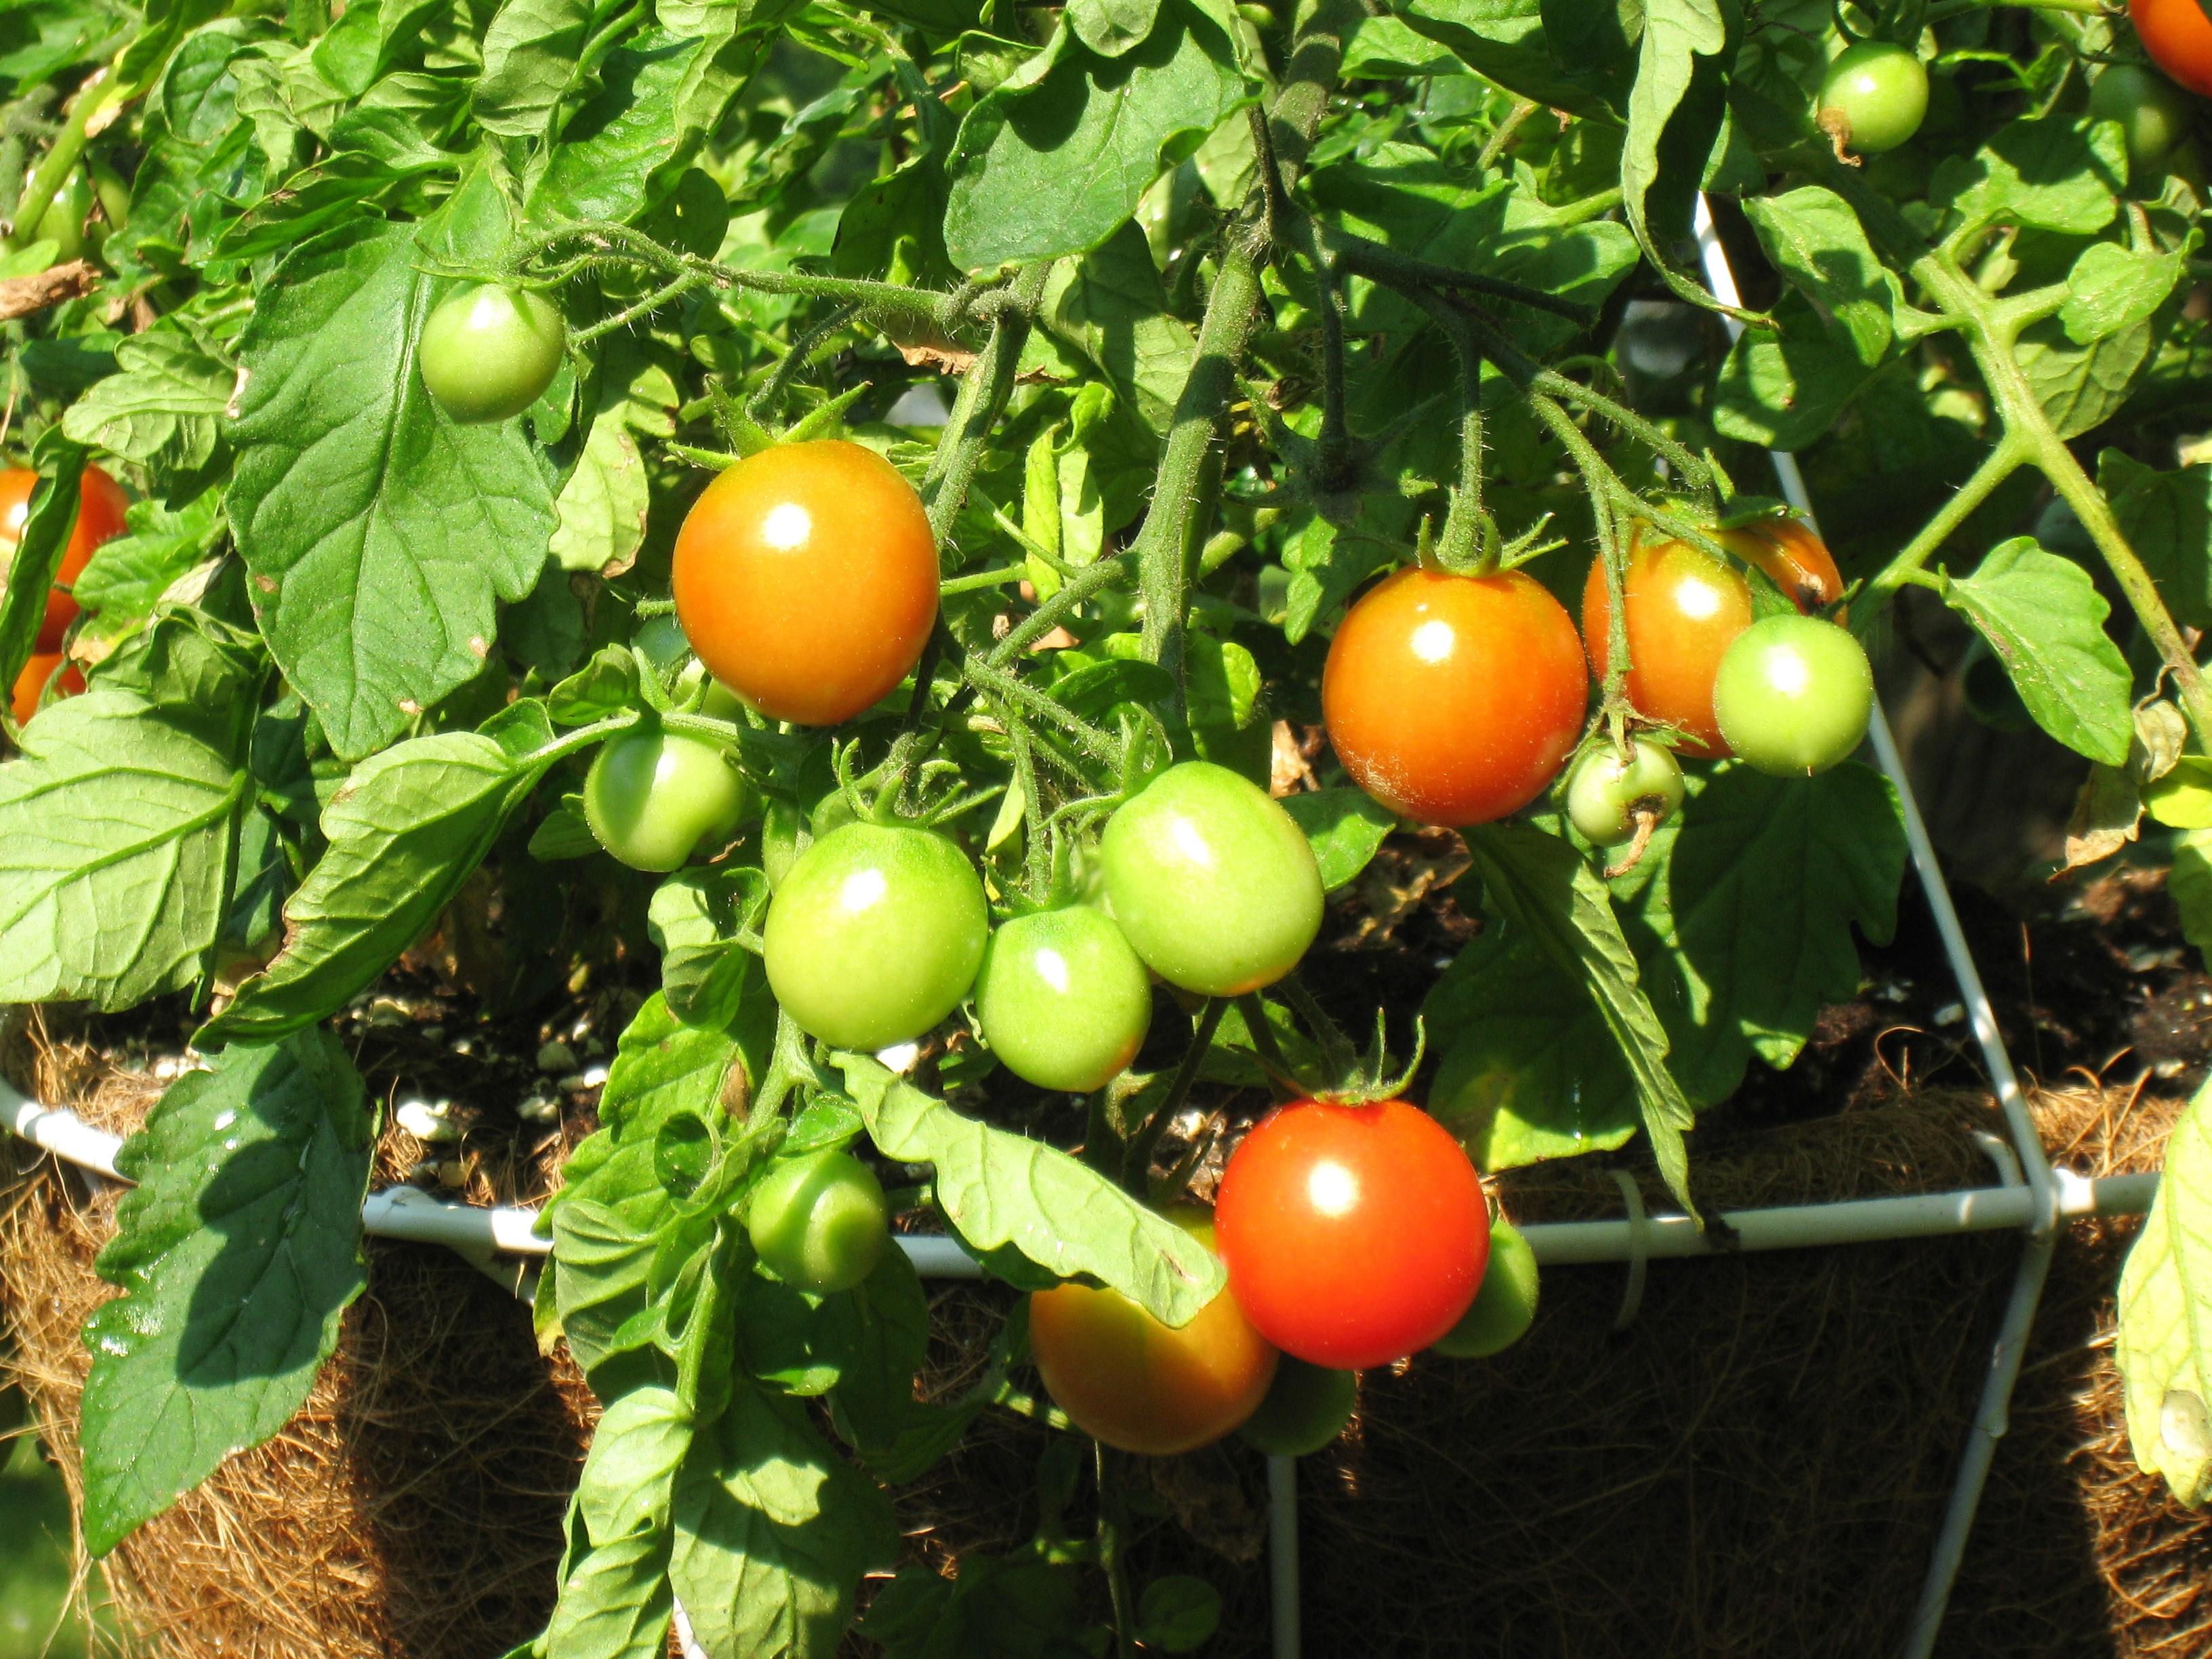 early backyard harvest everyday adventures in havachon heaven